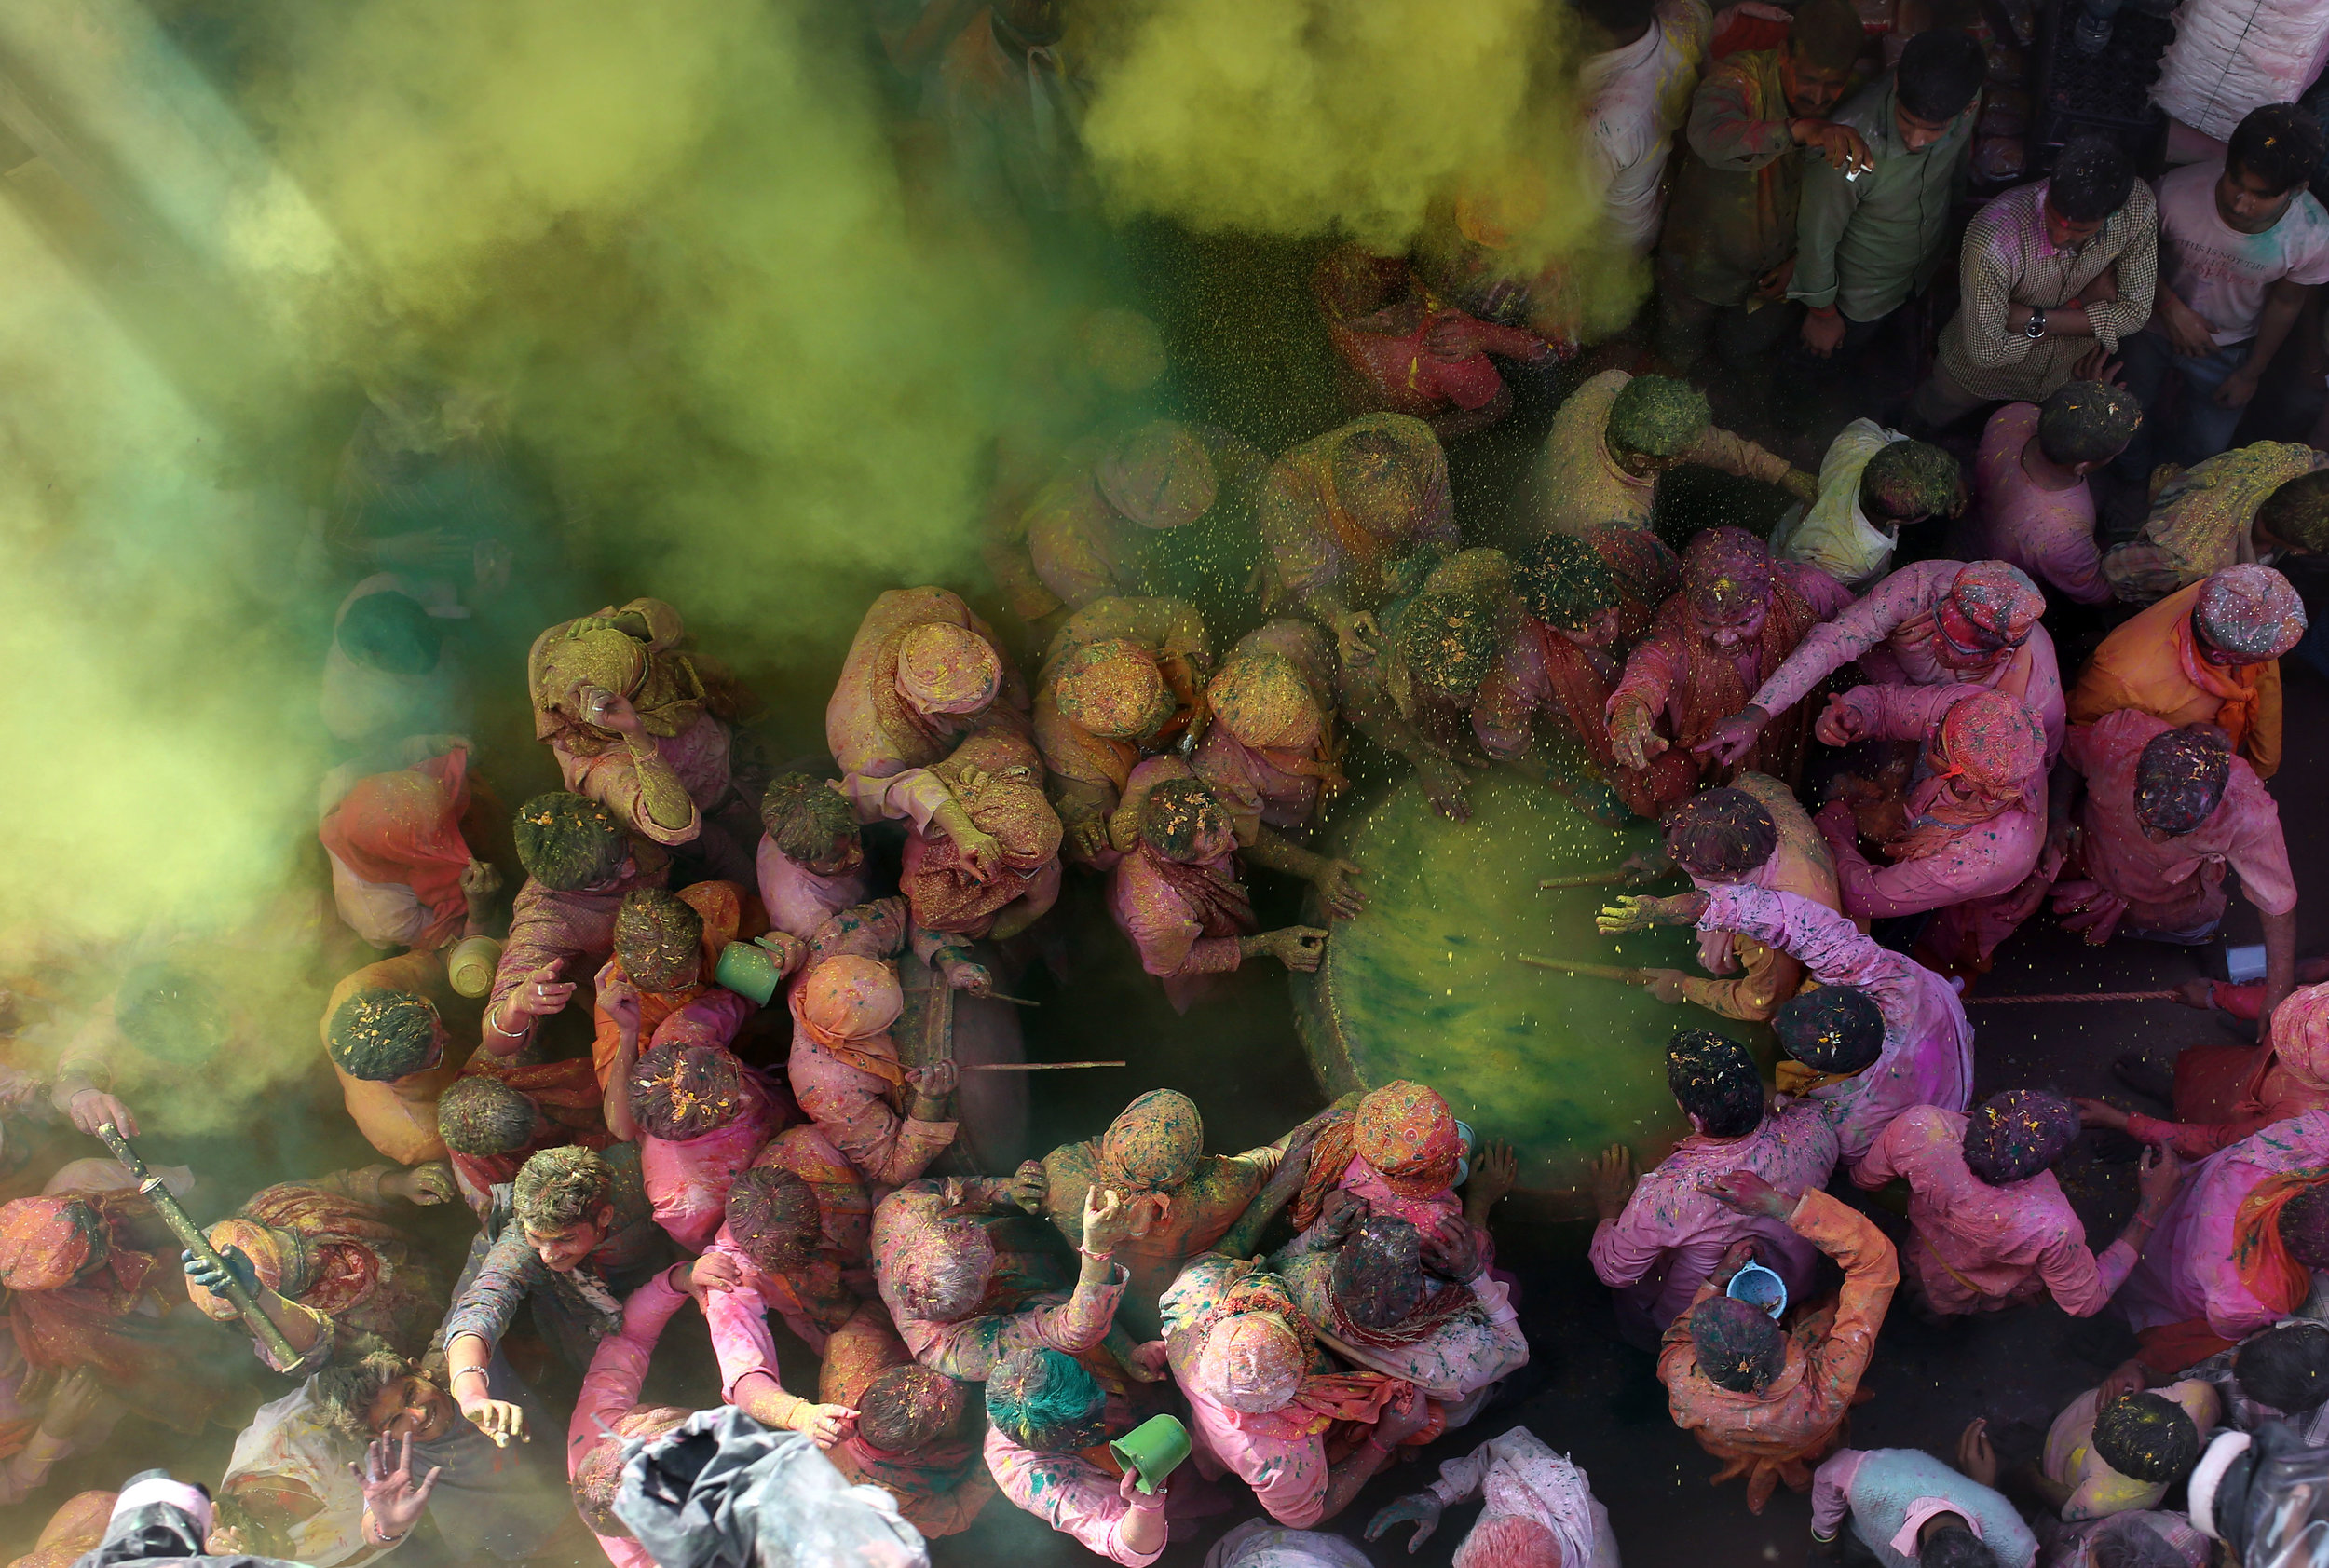 Uttar Pradesh Holi Festival27.jpg